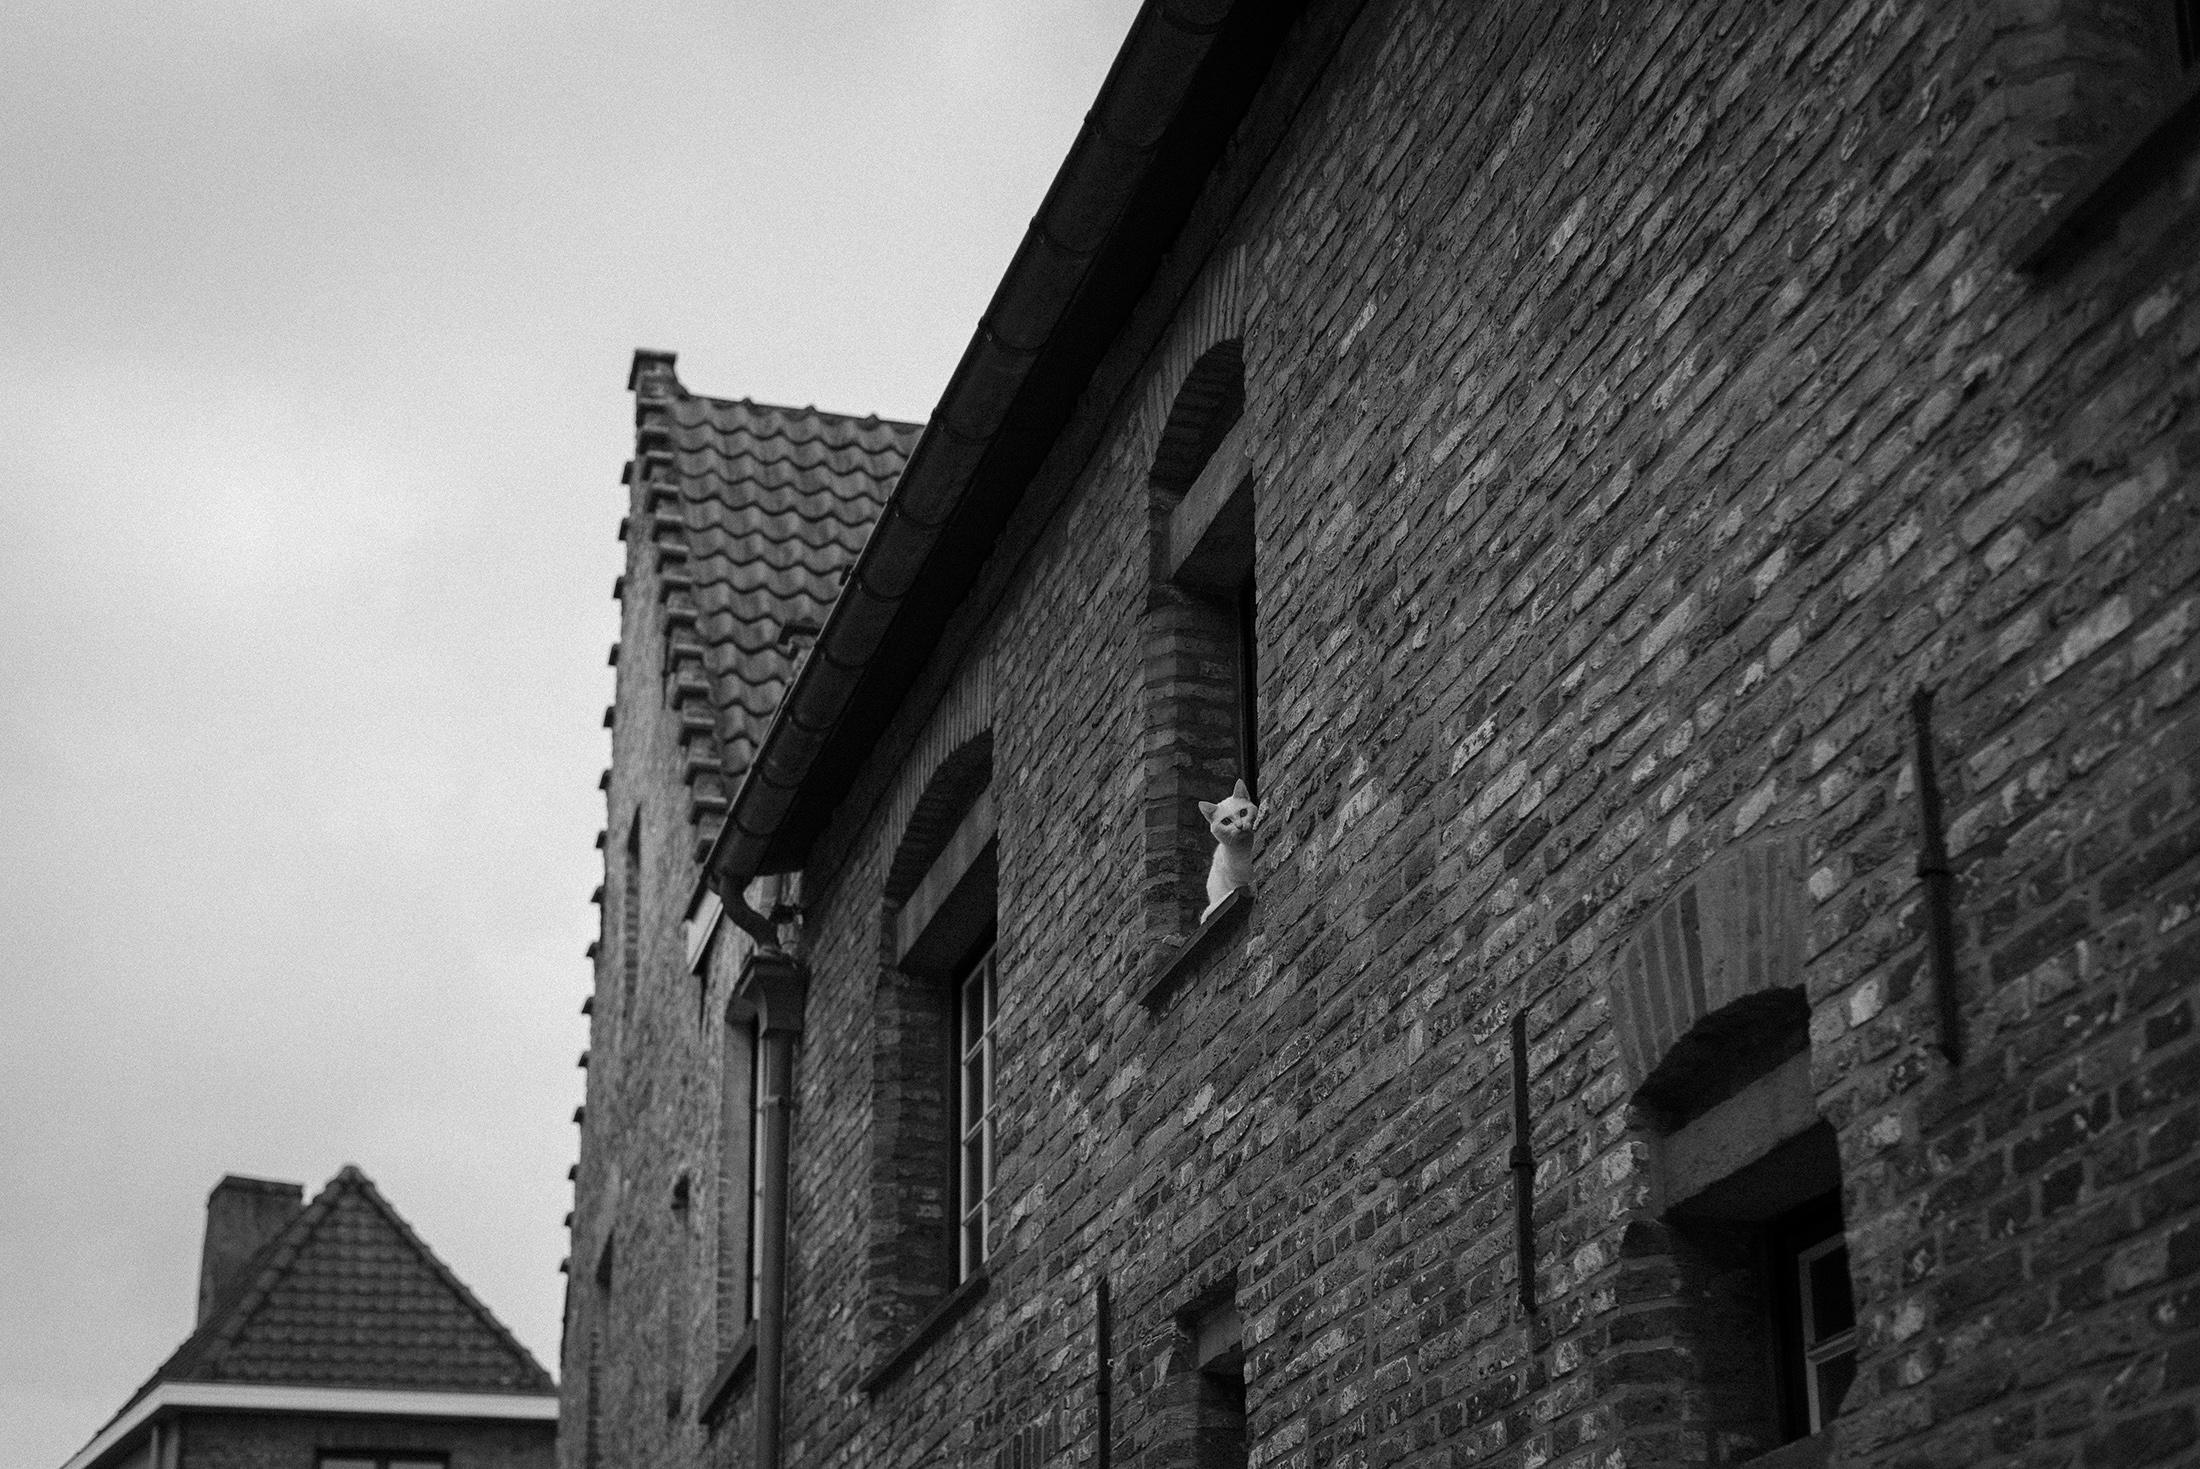 cat window Bruges Belgium - black and white photograph - Patricia Martins Yellowish blog